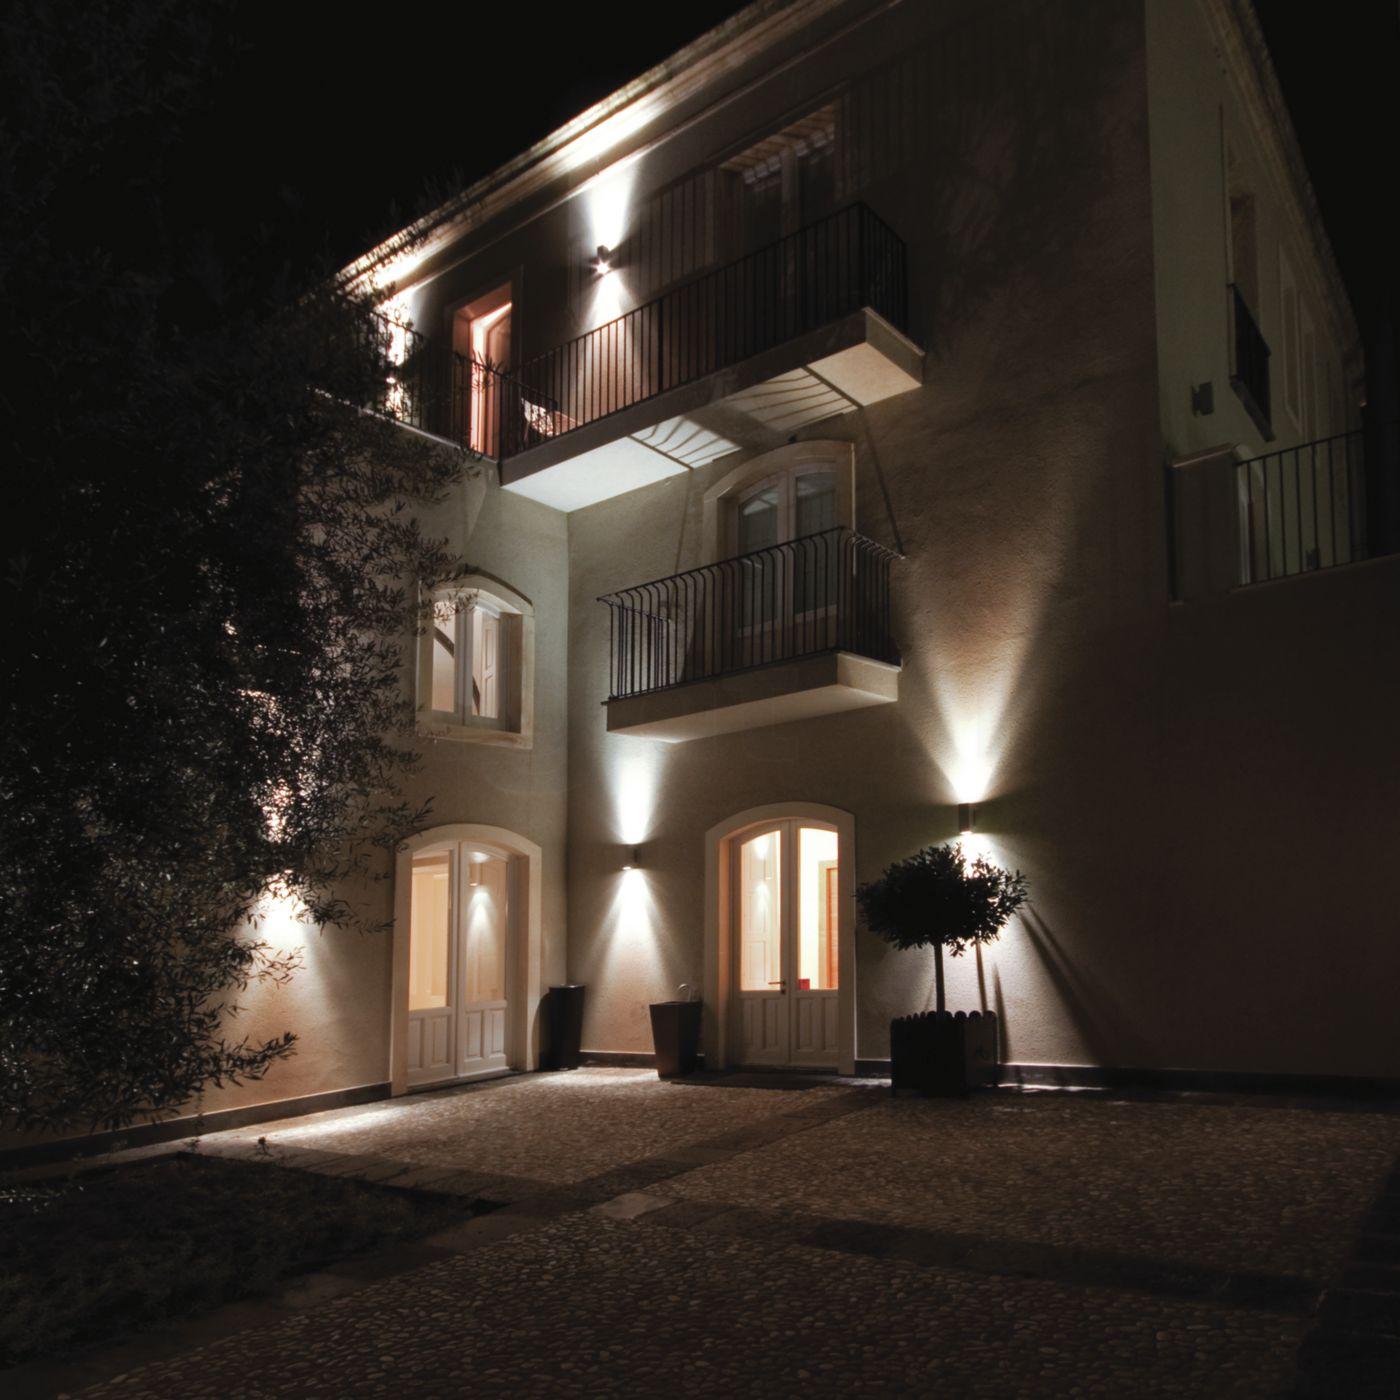 Buy ares emma 110 wall light up down at light11 aloadofball Choice Image